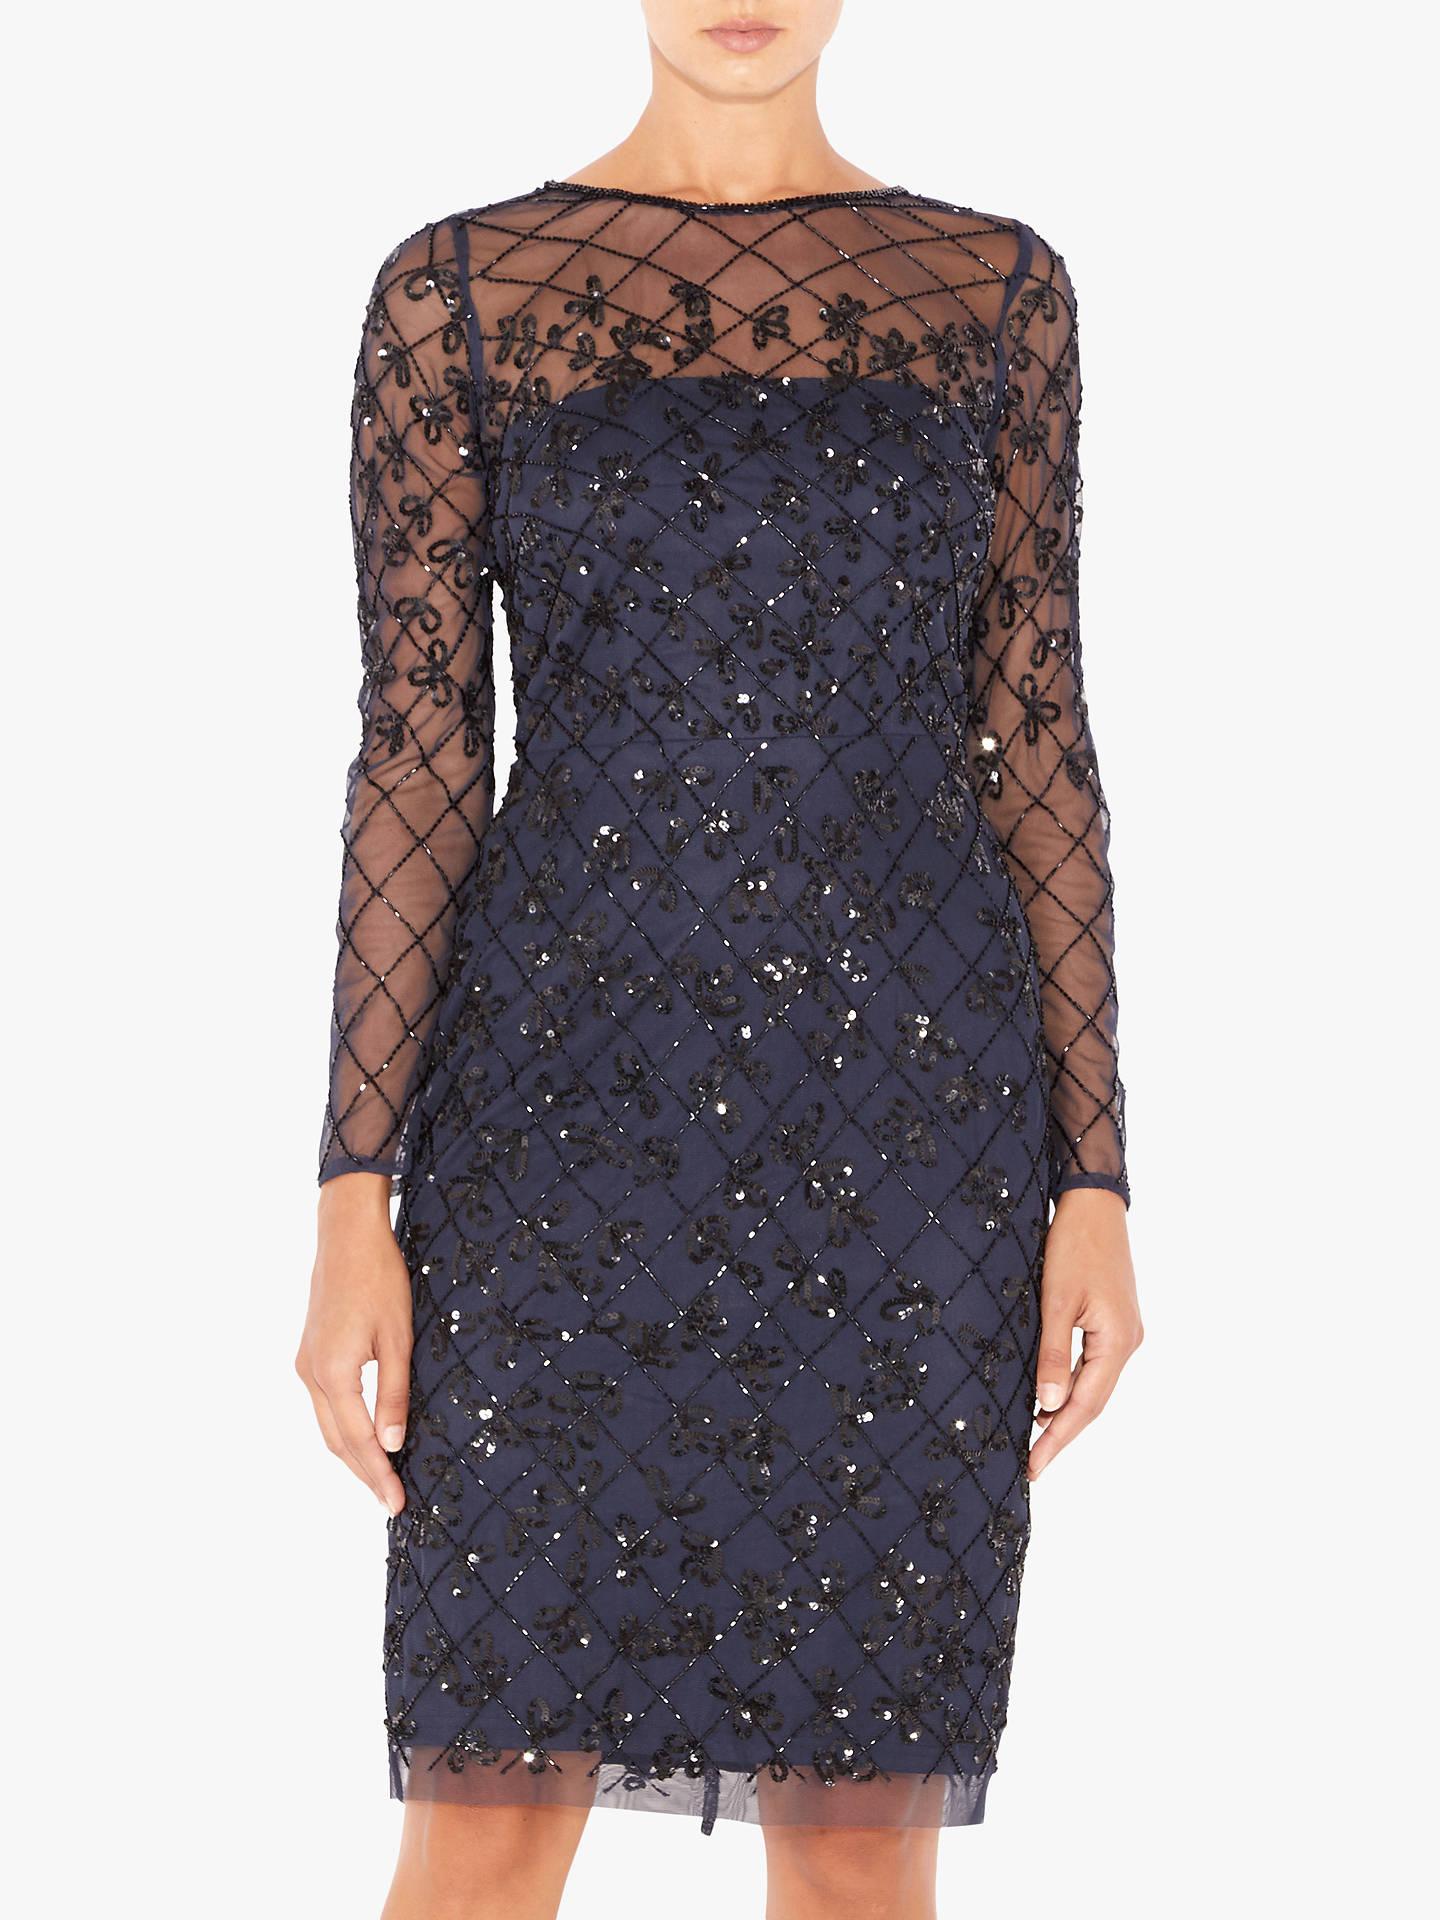 331a4d3d75375 Buy Adrianna Papell Short Beaded Dress, Blue/Black, 8 Online at johnlewis.